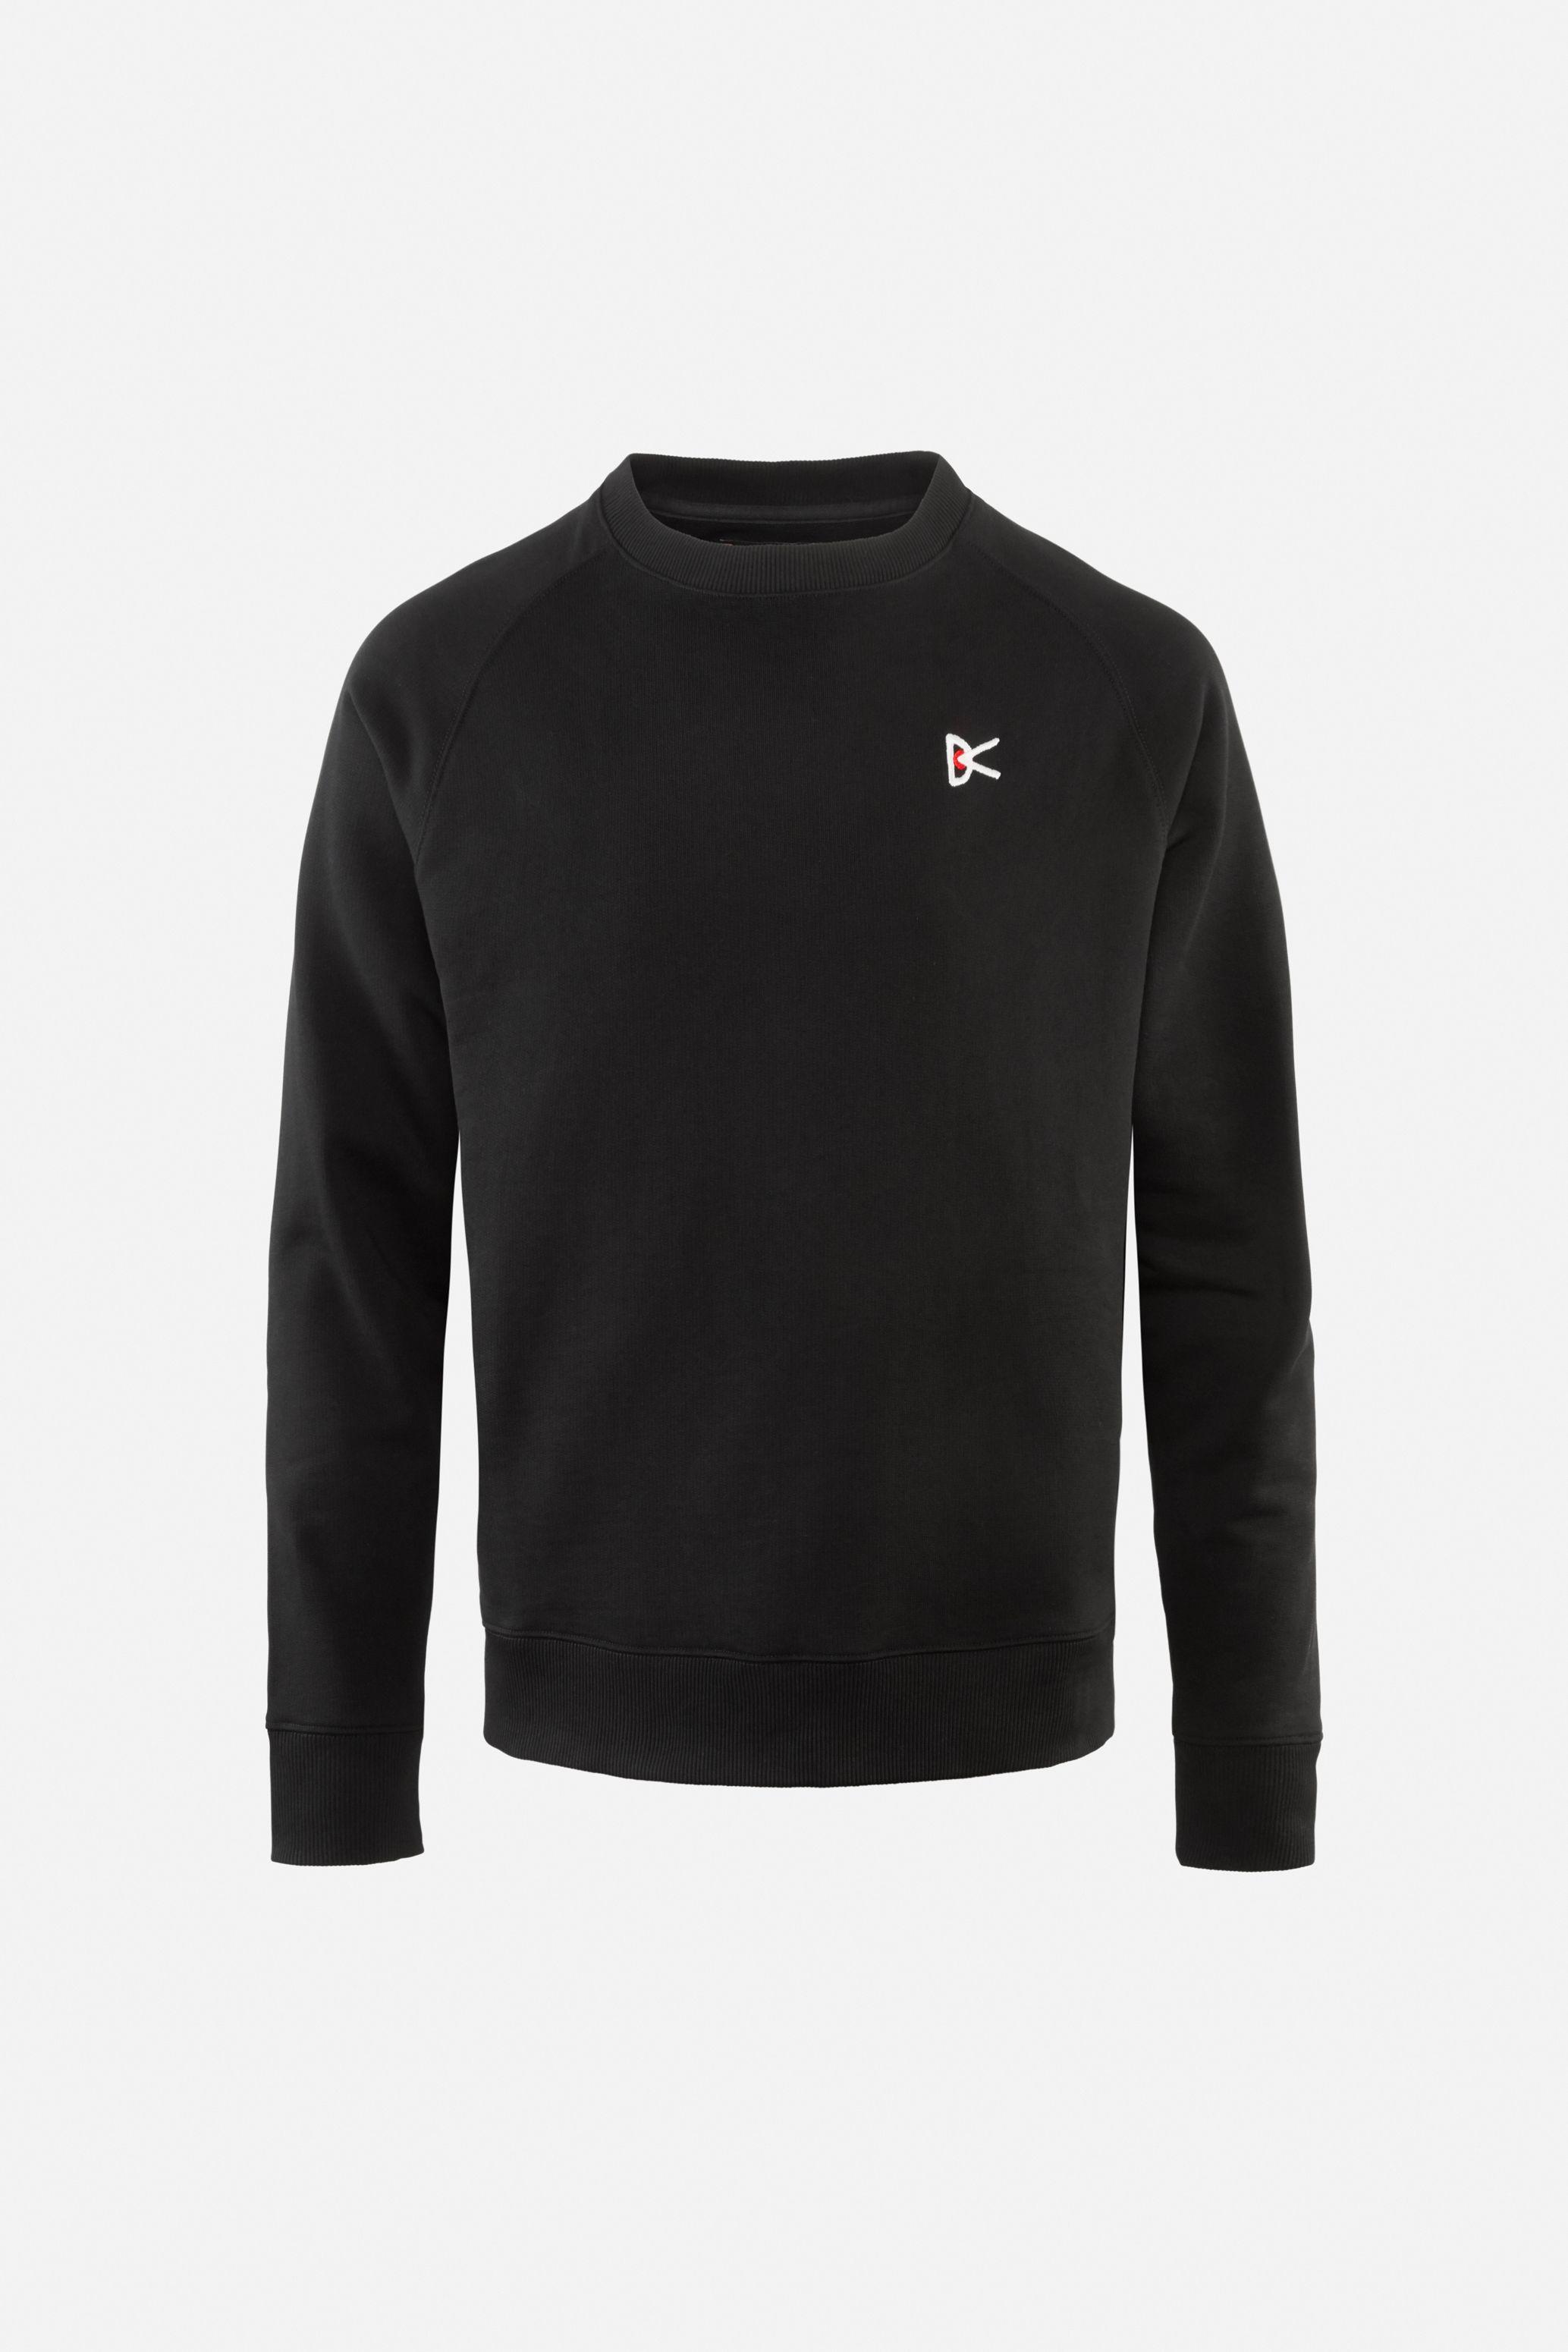 Sati Crew Neck Sweatshirt, Black